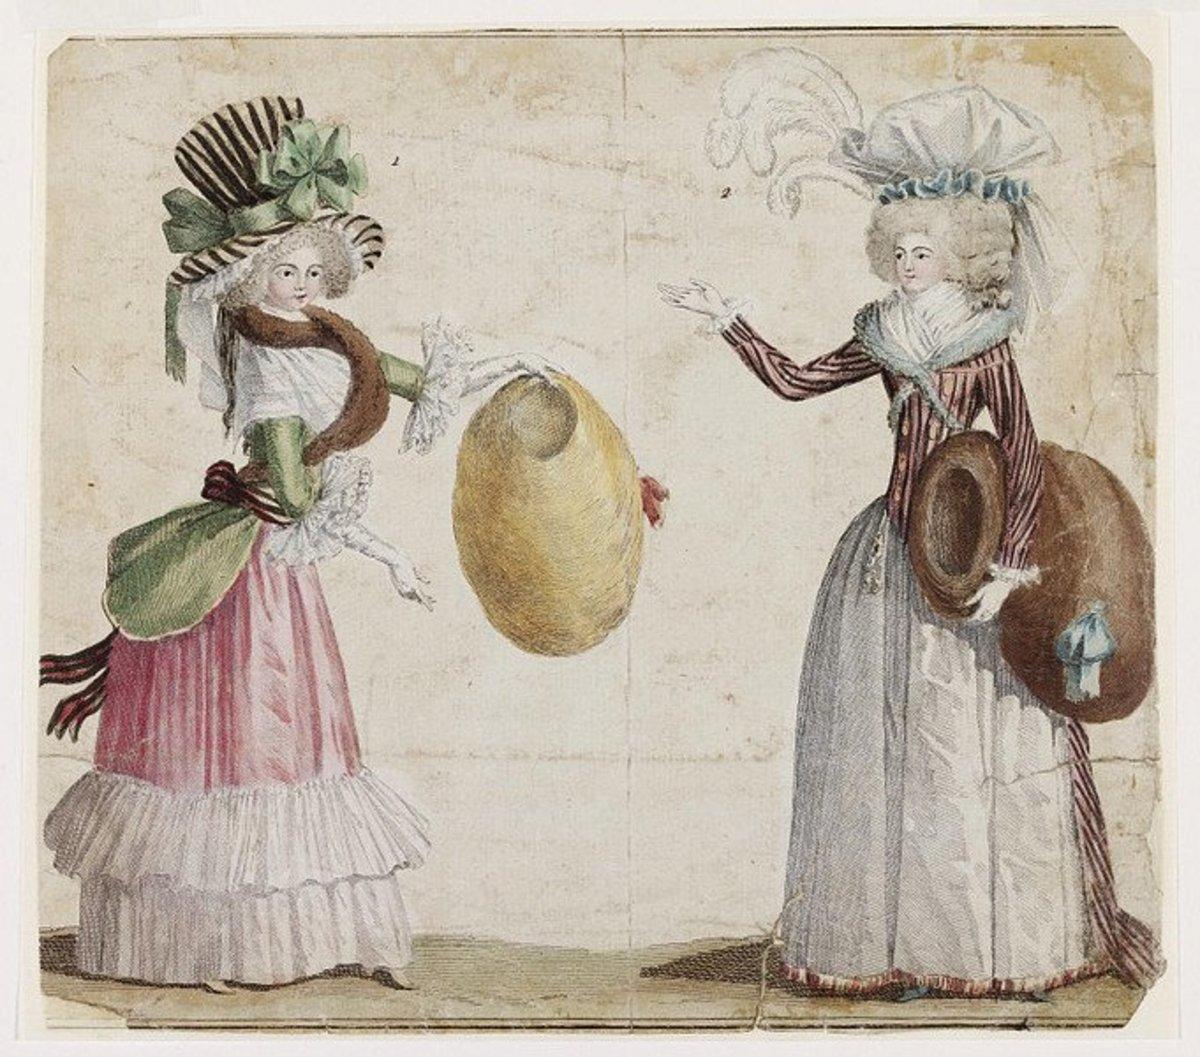 1787 fashion plate